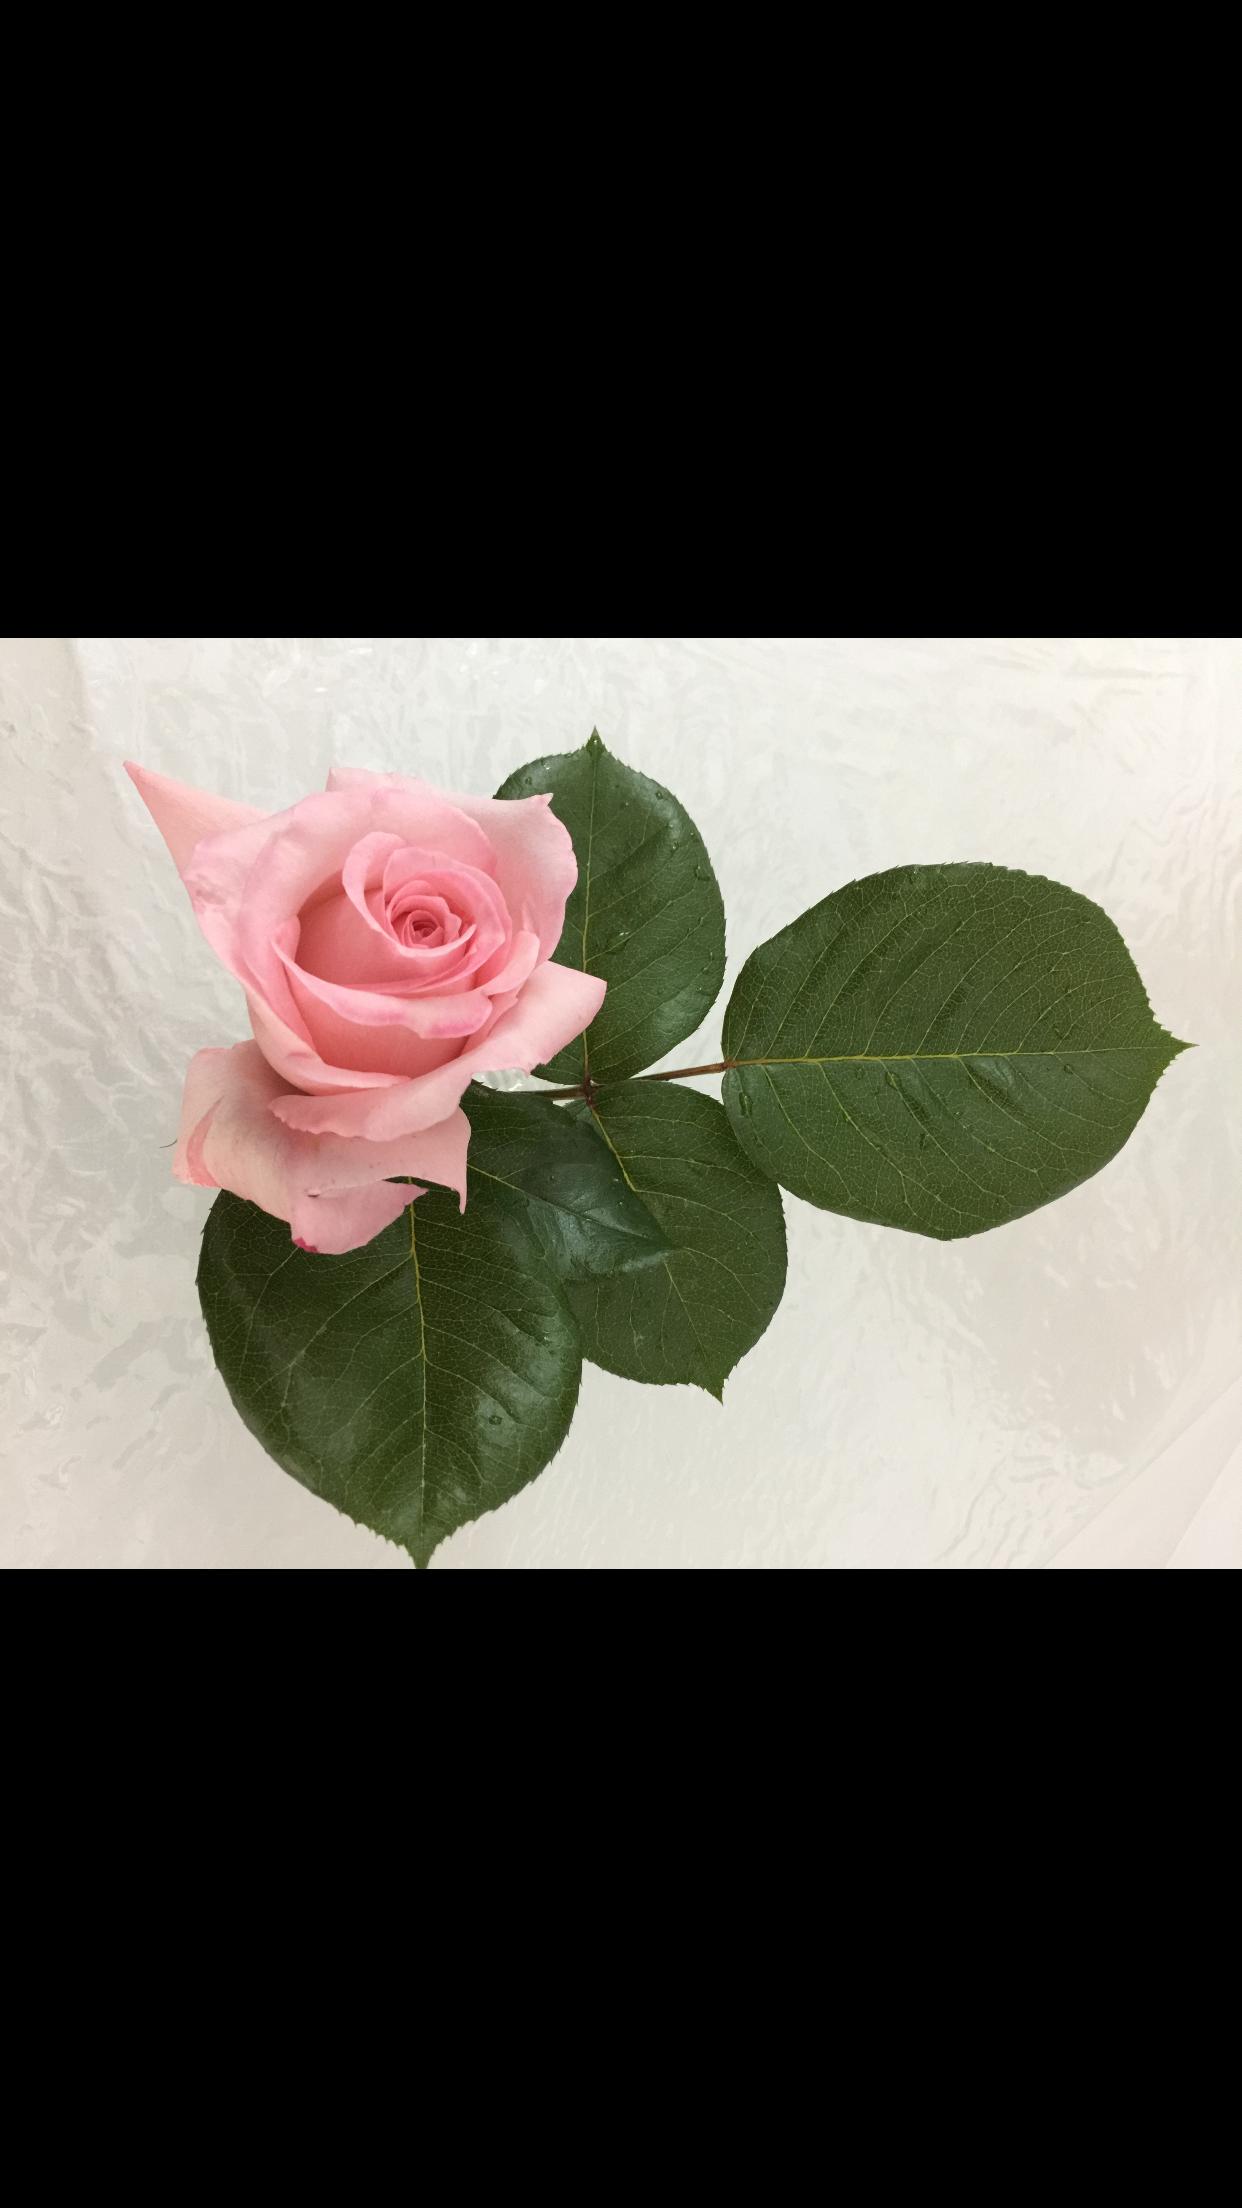 Pin By سهير كريشان On تنسيق الورود Rose Plants Flowers